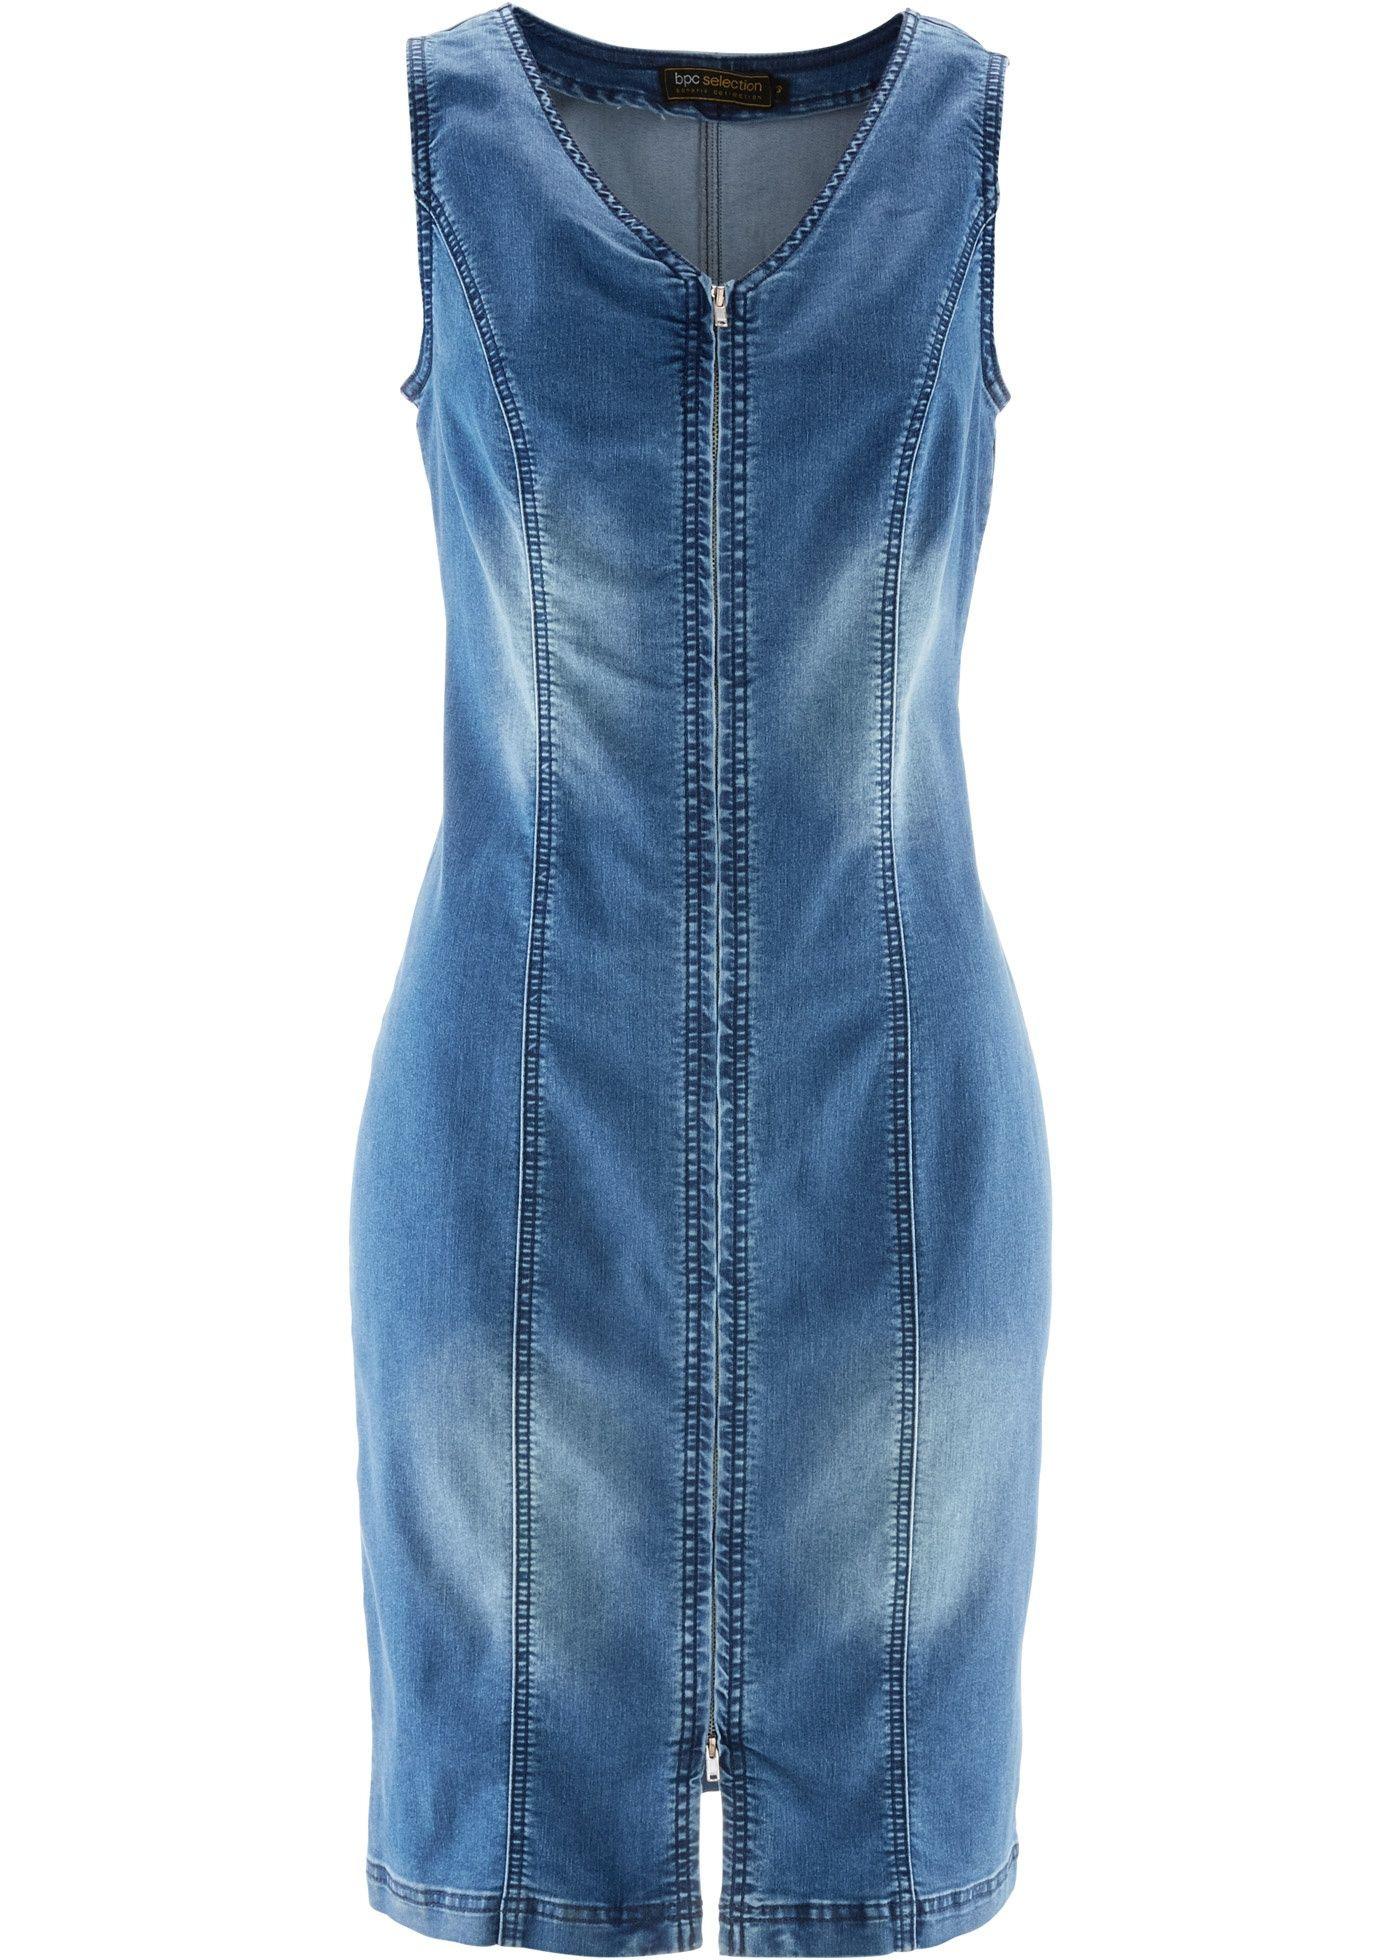 Jeanskleid Mit Rei Verschluss Blue Stone  Bpc Selection